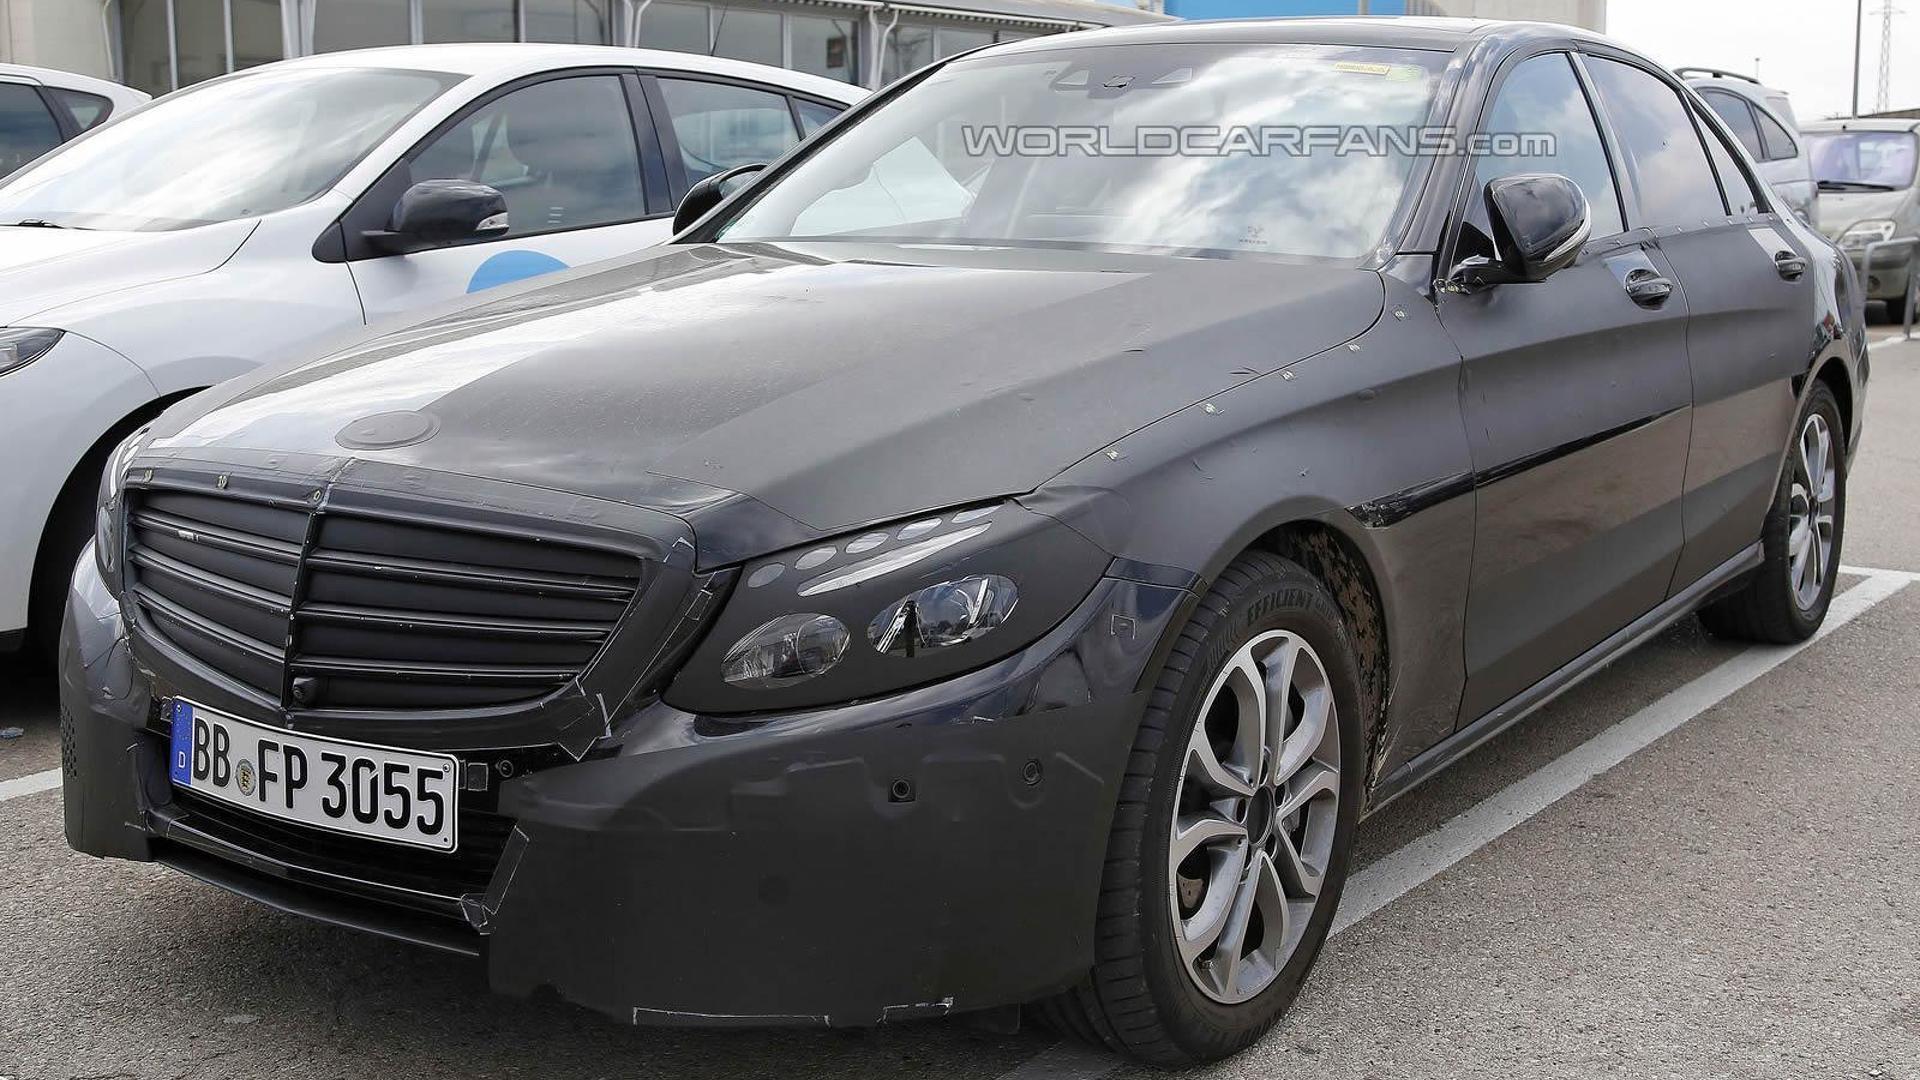 Mercedes Benz C Class Plug In Hybrid First Spy Shots Emerge